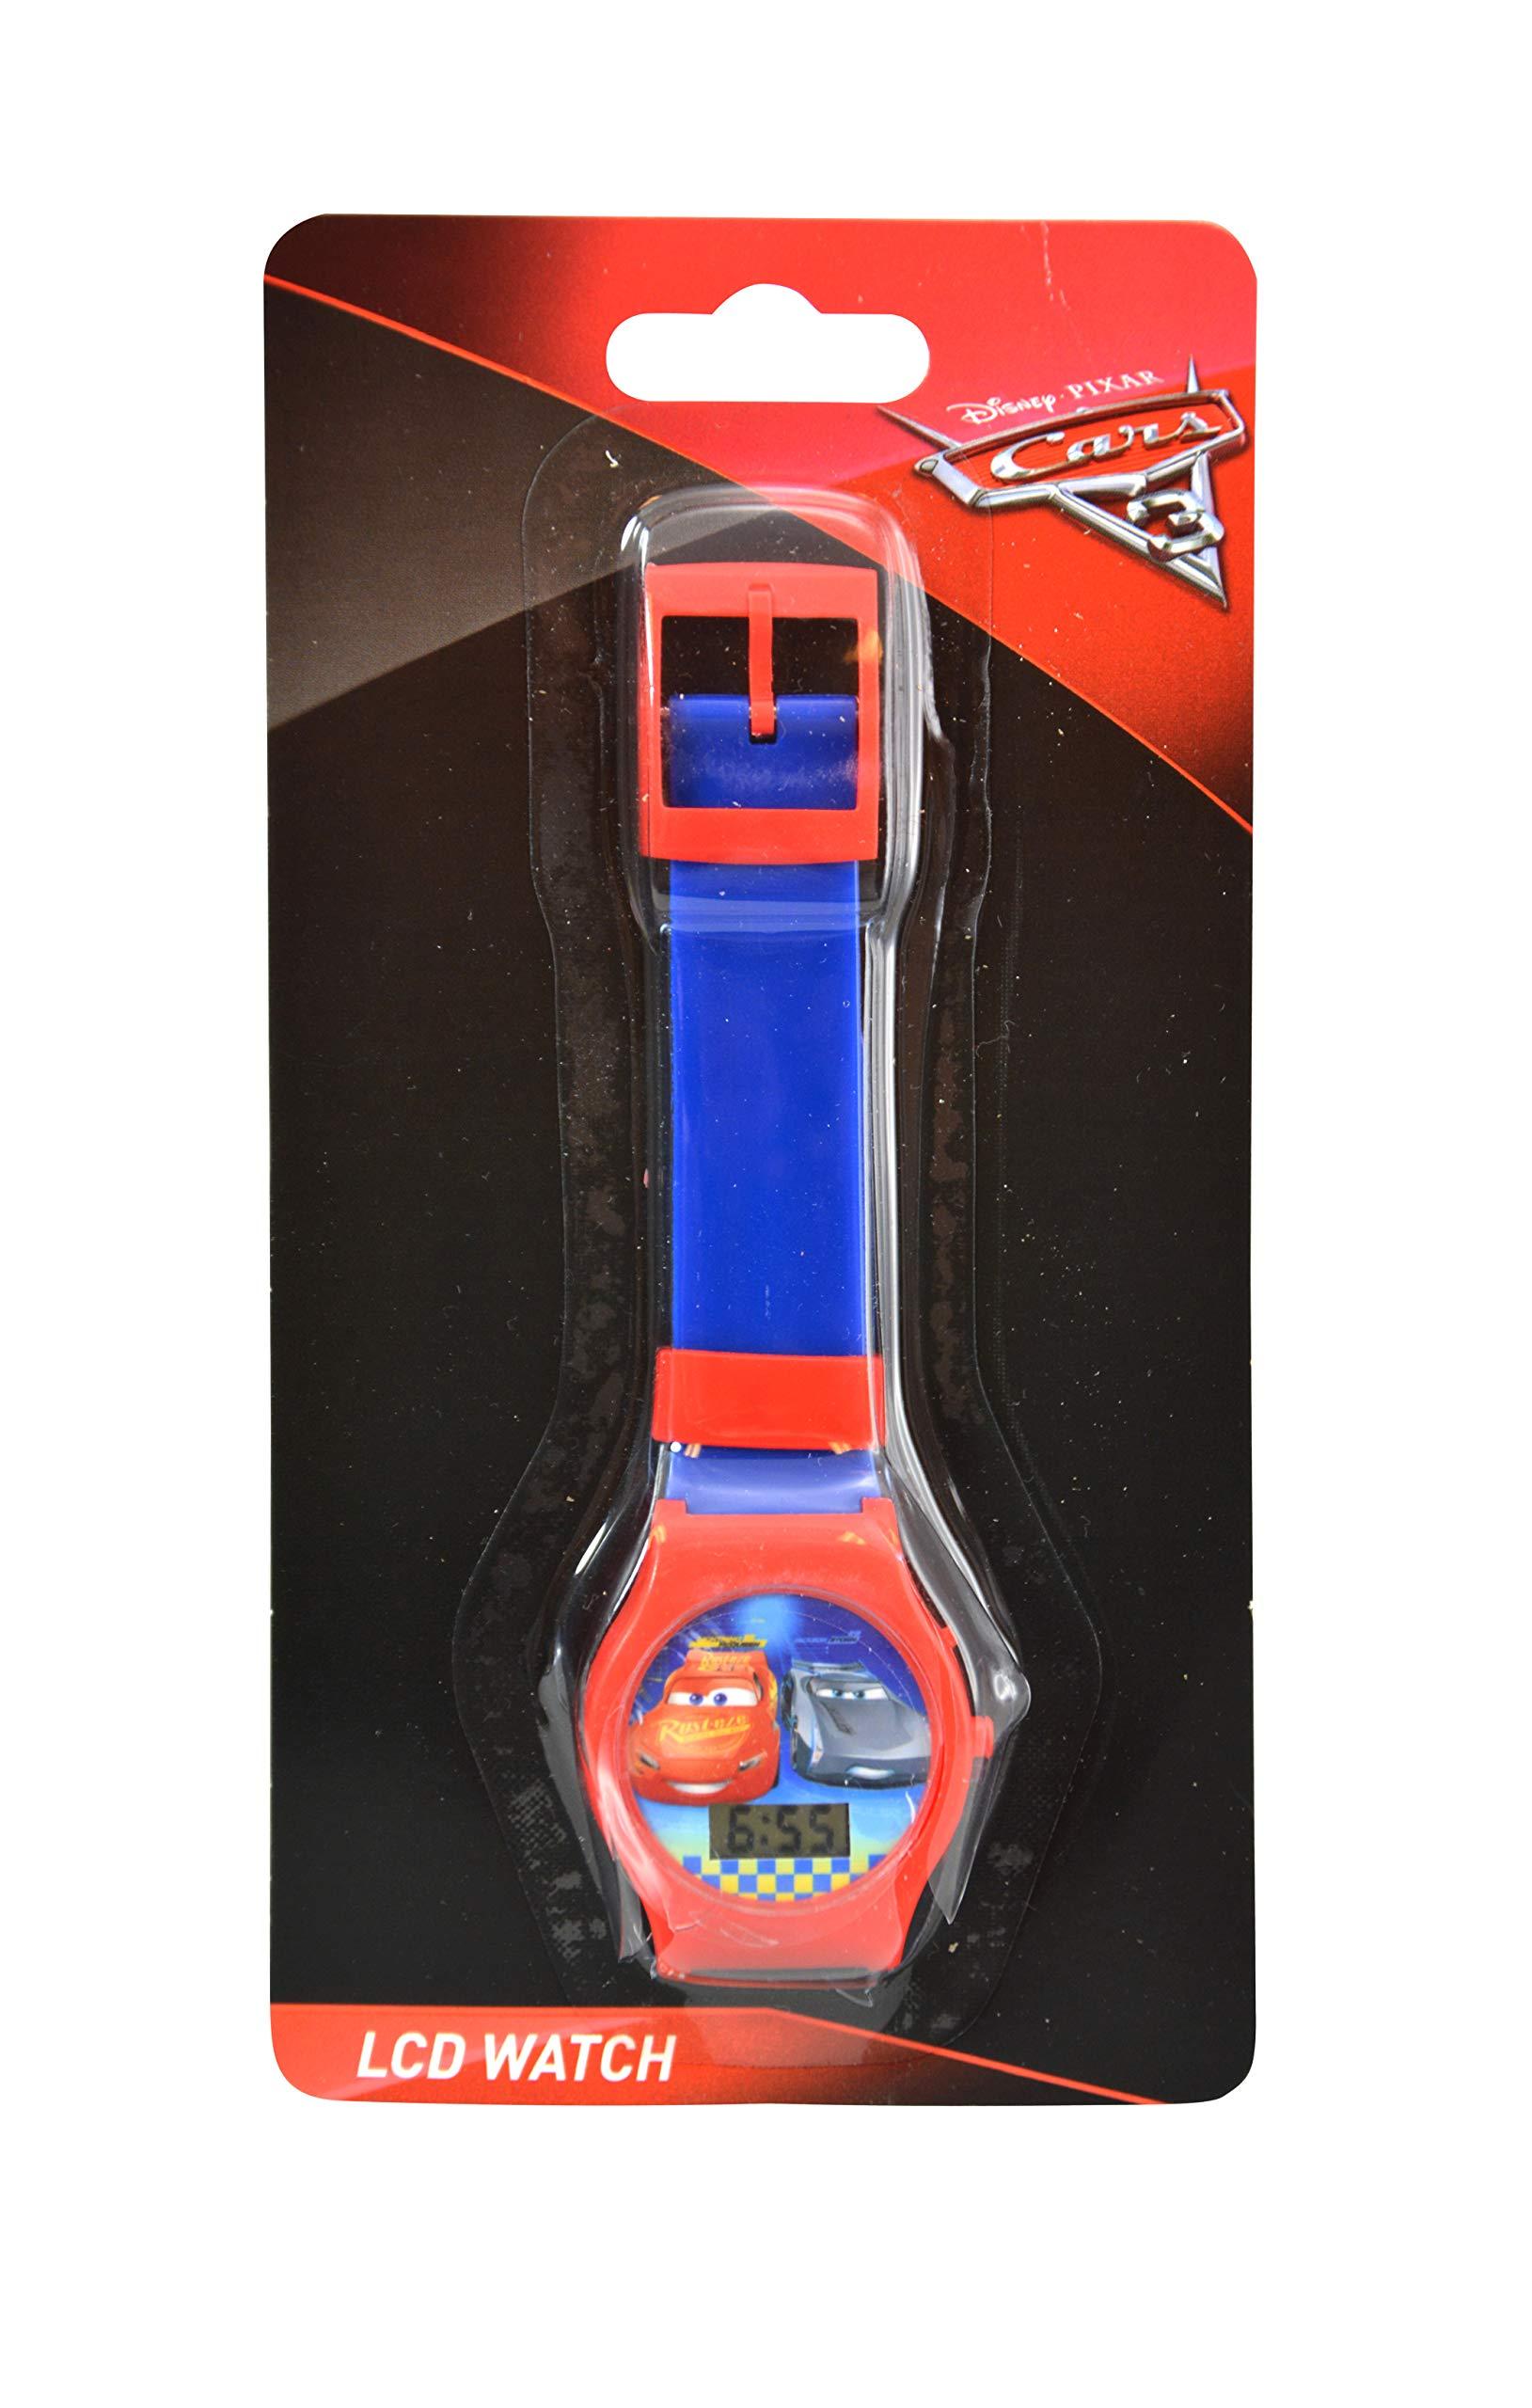 Karacter Box Disney Cars 3 LCD Digital Watch, 6-Pack Party Favors by Karacter Box (Image #3)